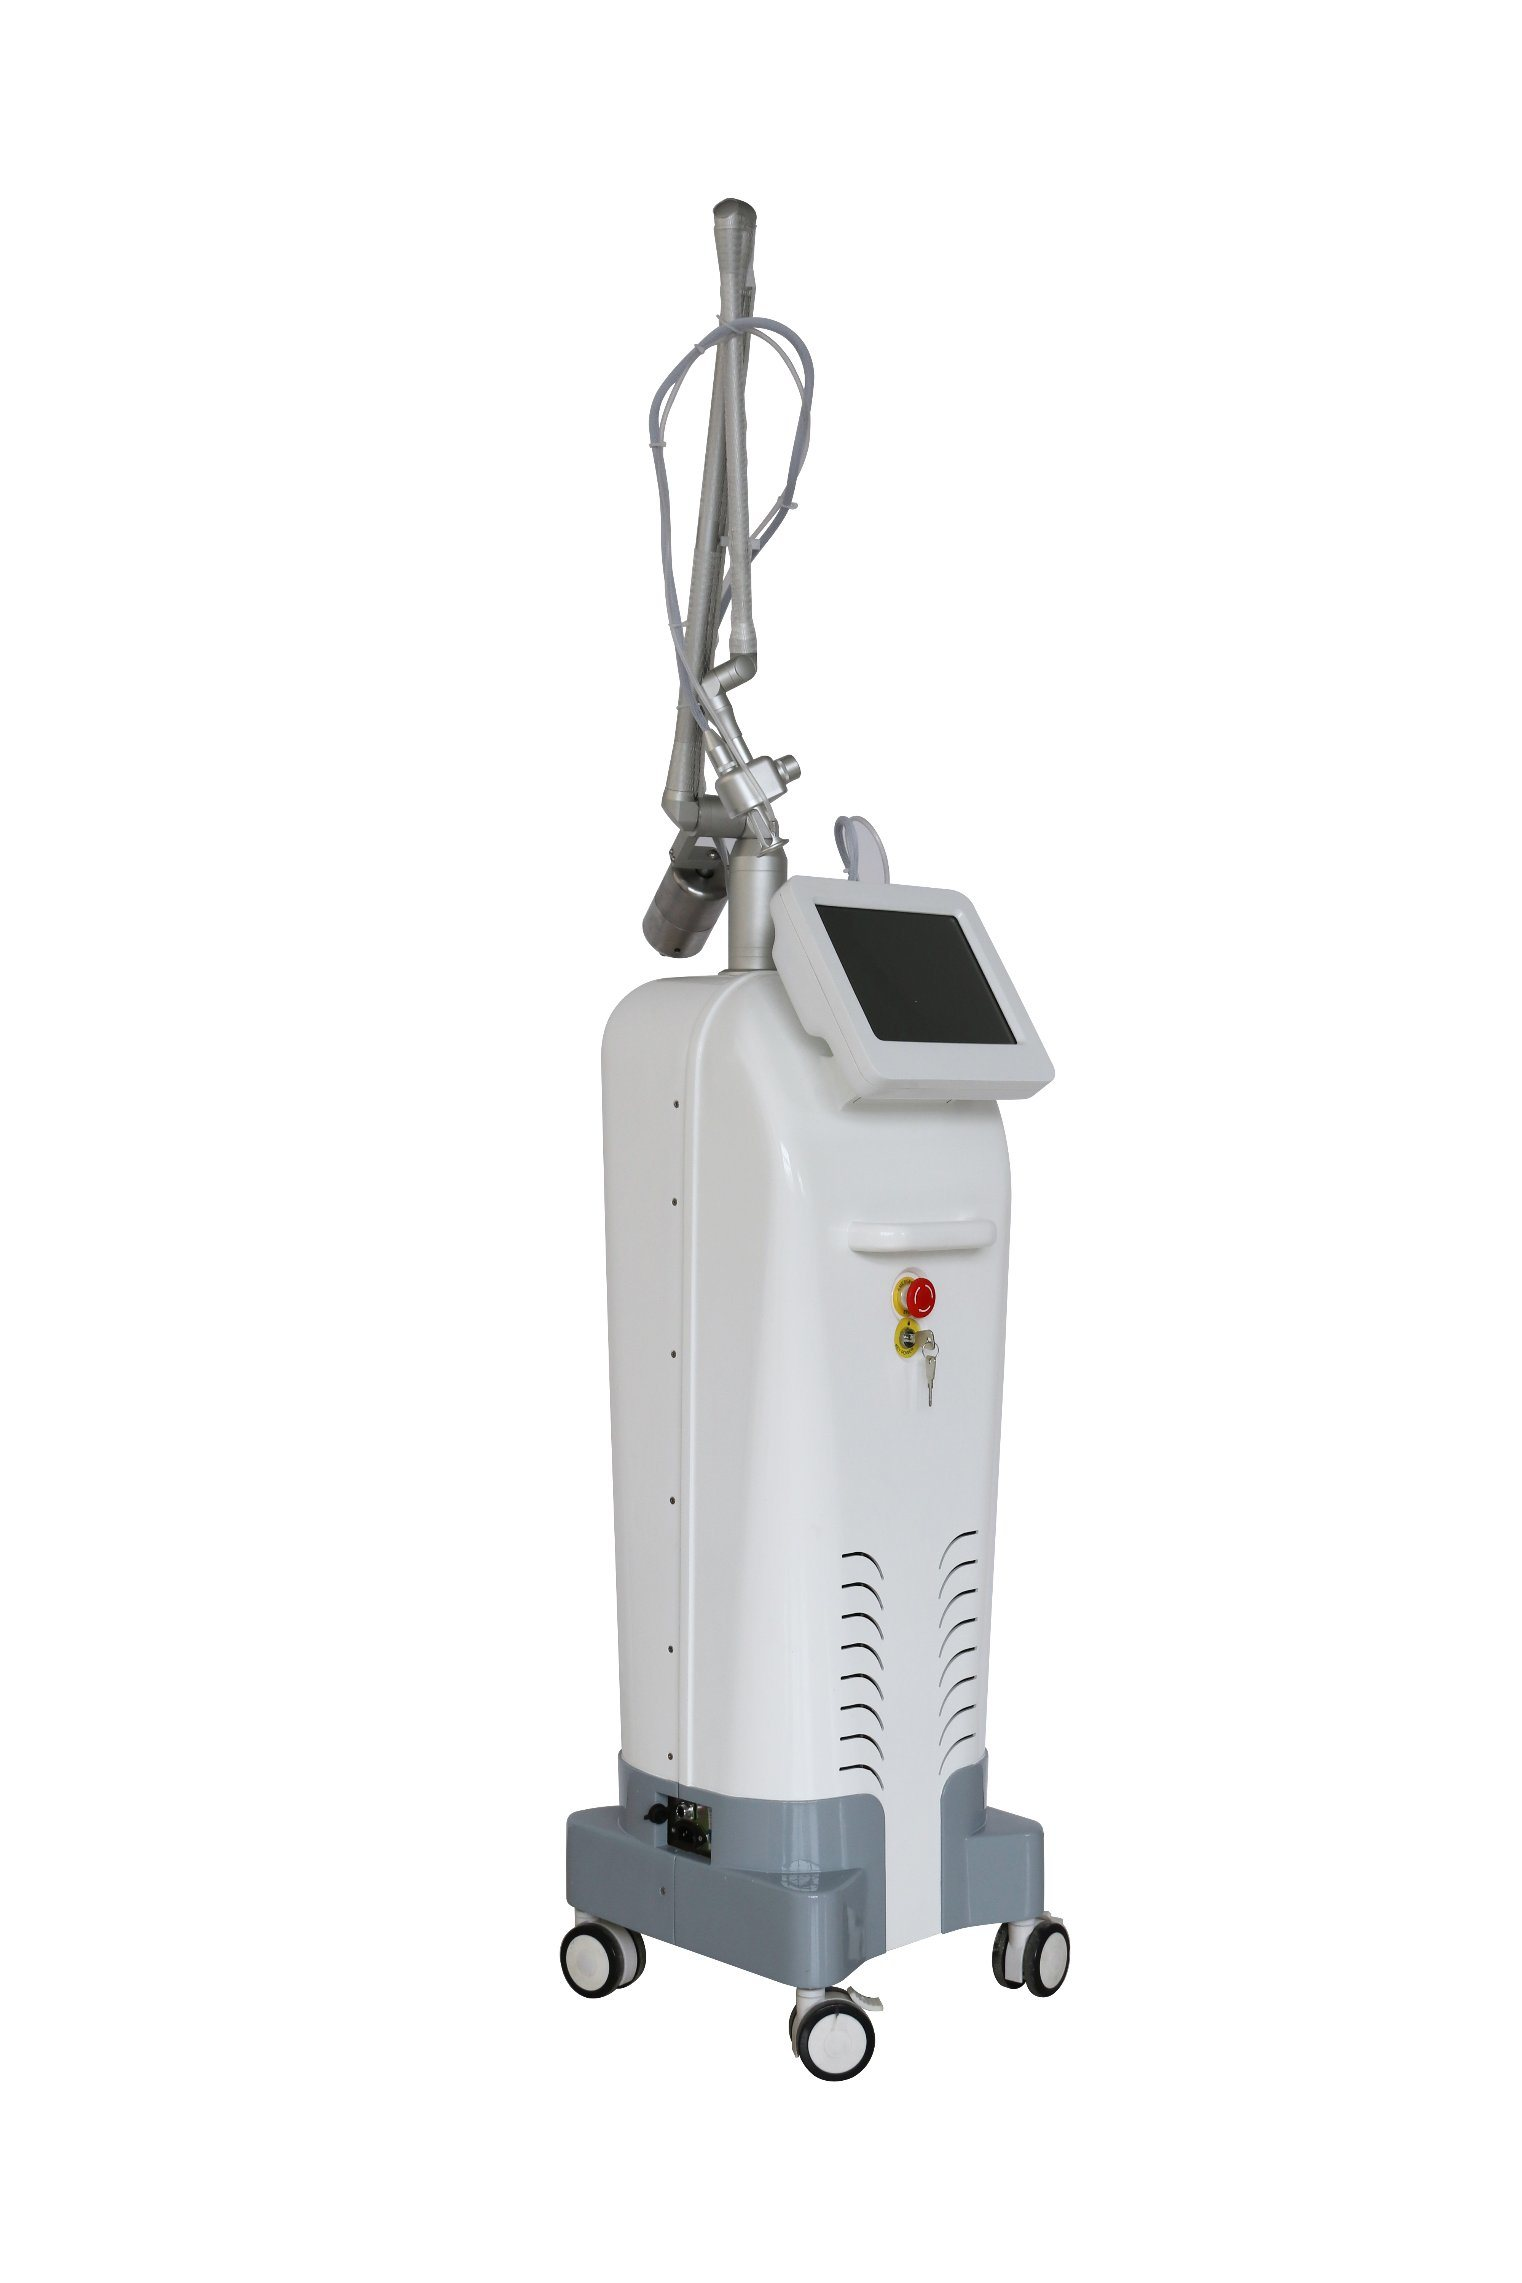 [Hot Item] USA Coherent Metal Tube Medical RF CO2 Fractional Laser Cosmetic  Laser Machine